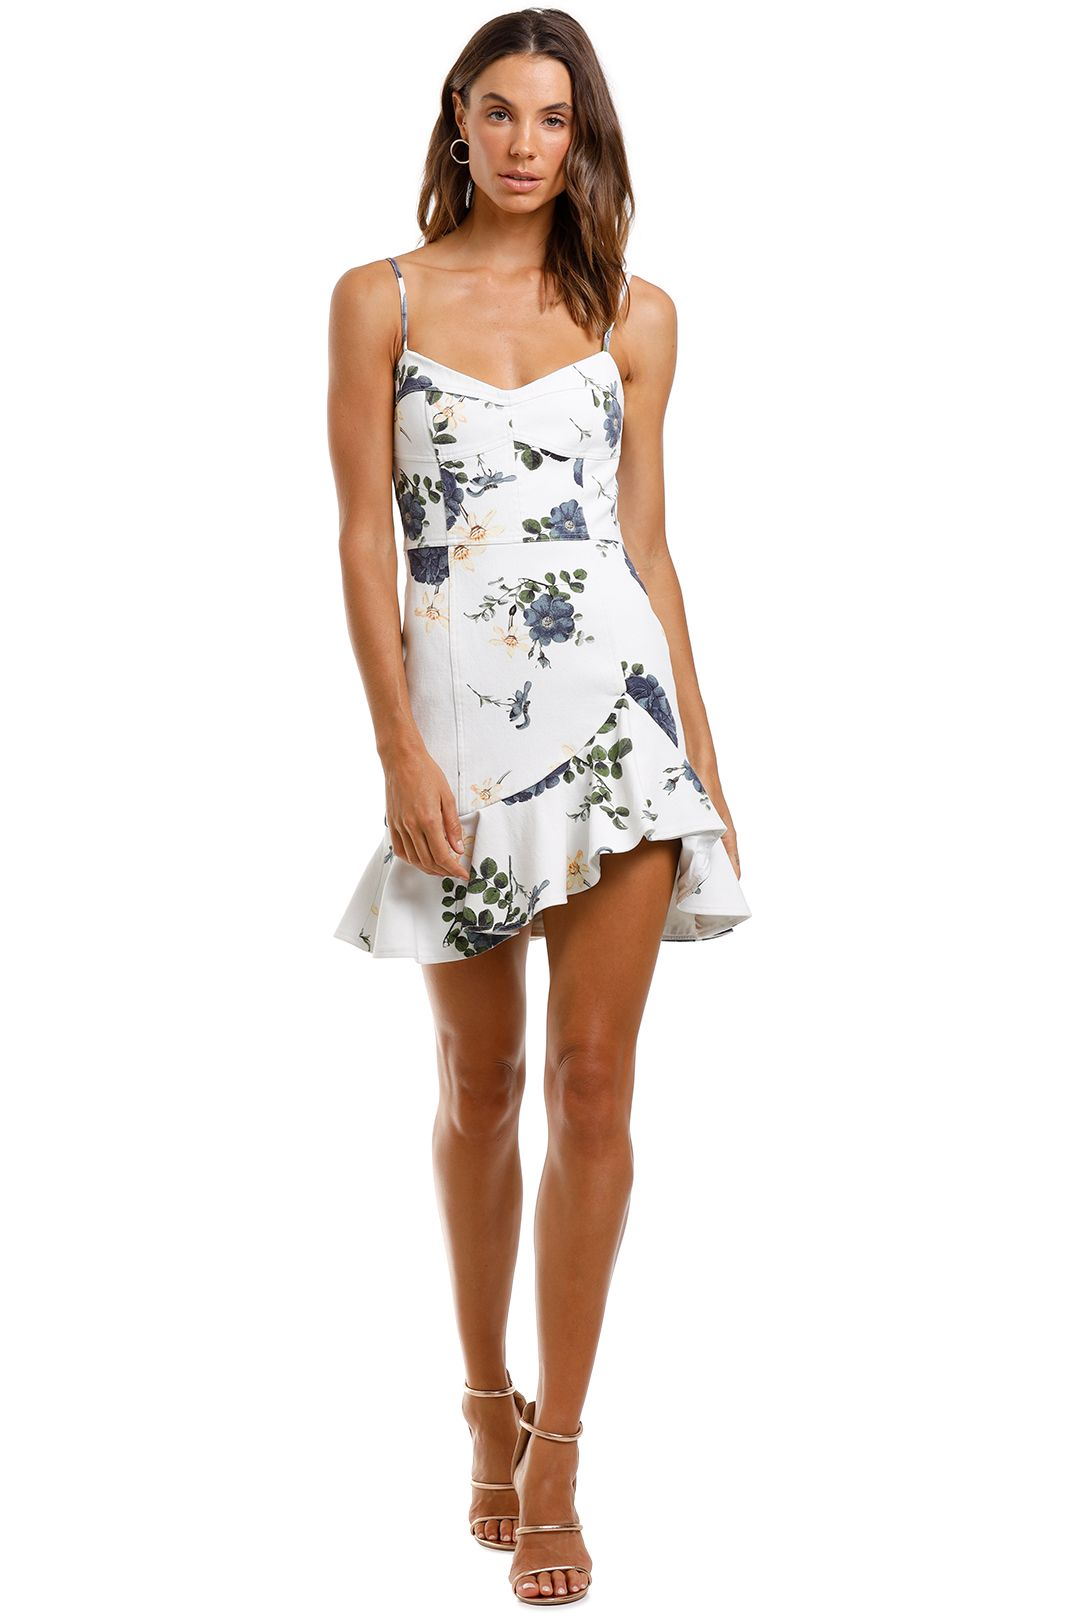 Nicholas Blue Rose Frill Dress White Floral Sleeveless